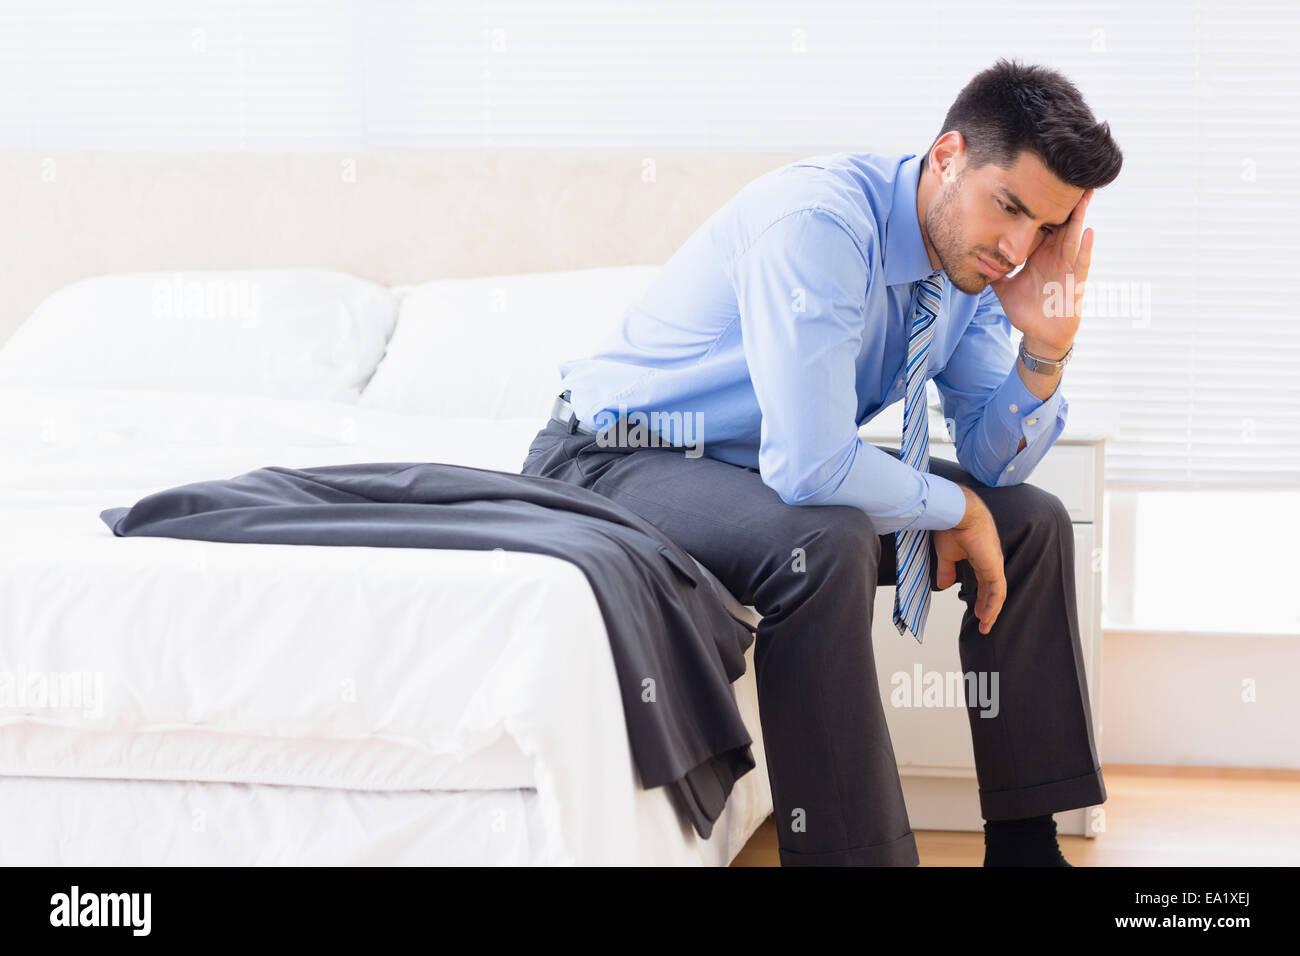 Stirnrunzelnd Geschäftsmann am Bettrand sitzen Stockbild